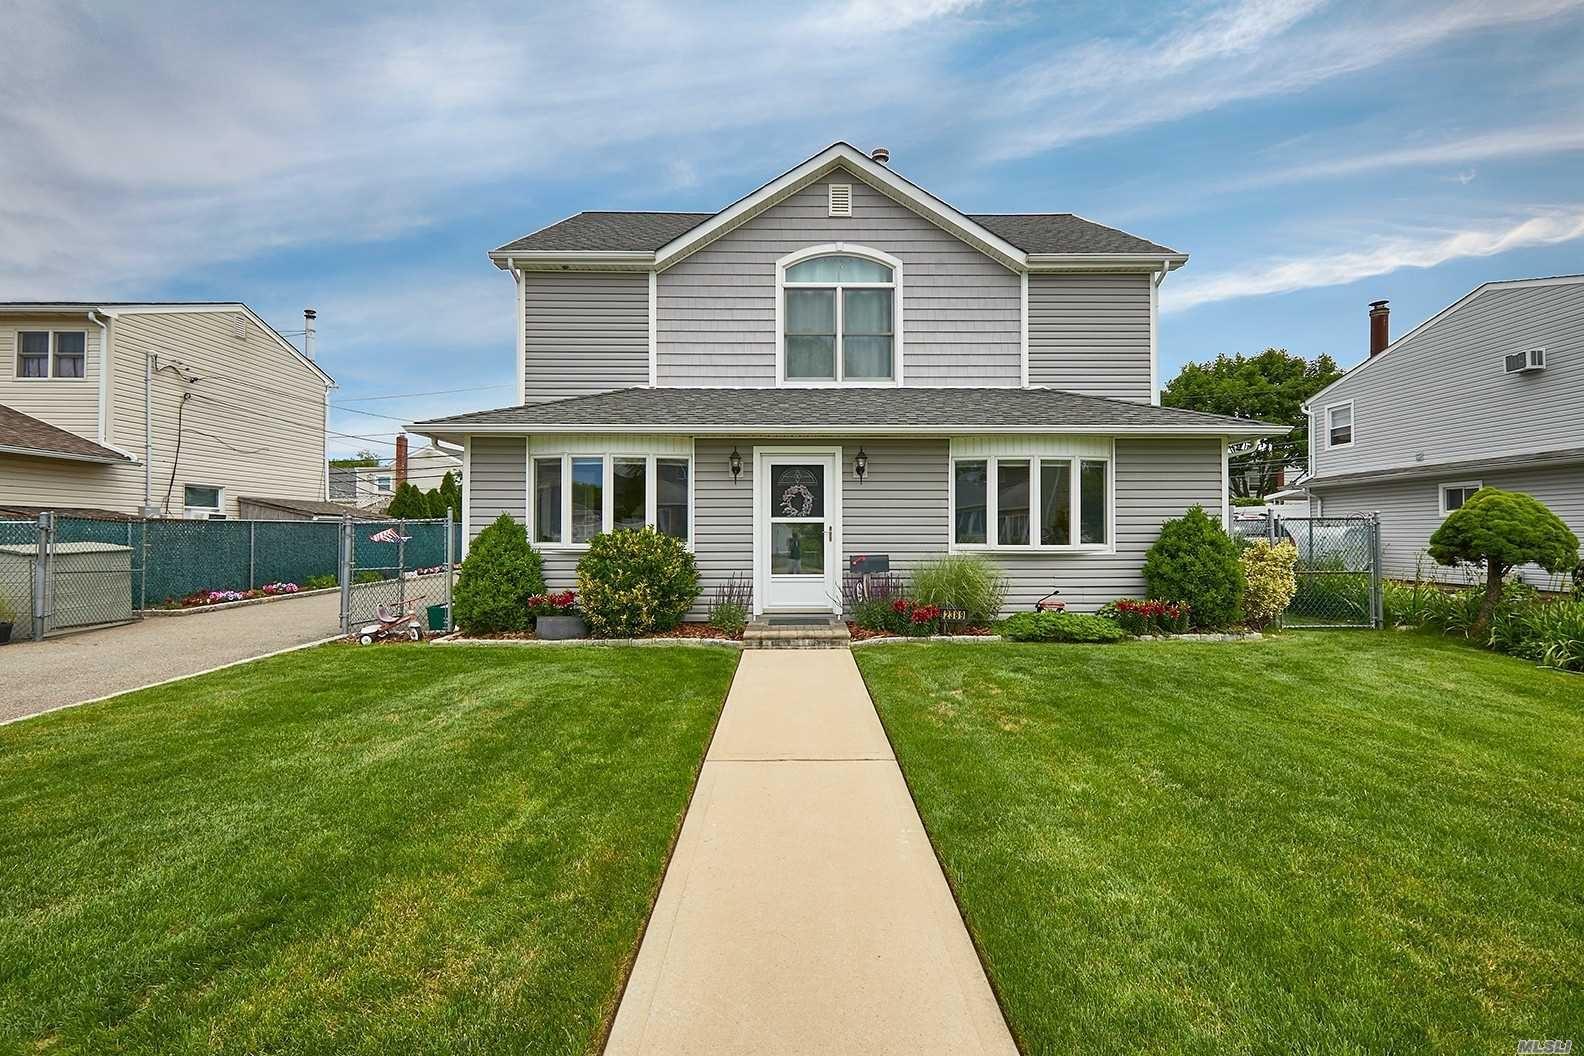 Seaford, NY Homes For Sale | MLSLI.com - Long Island Real ...